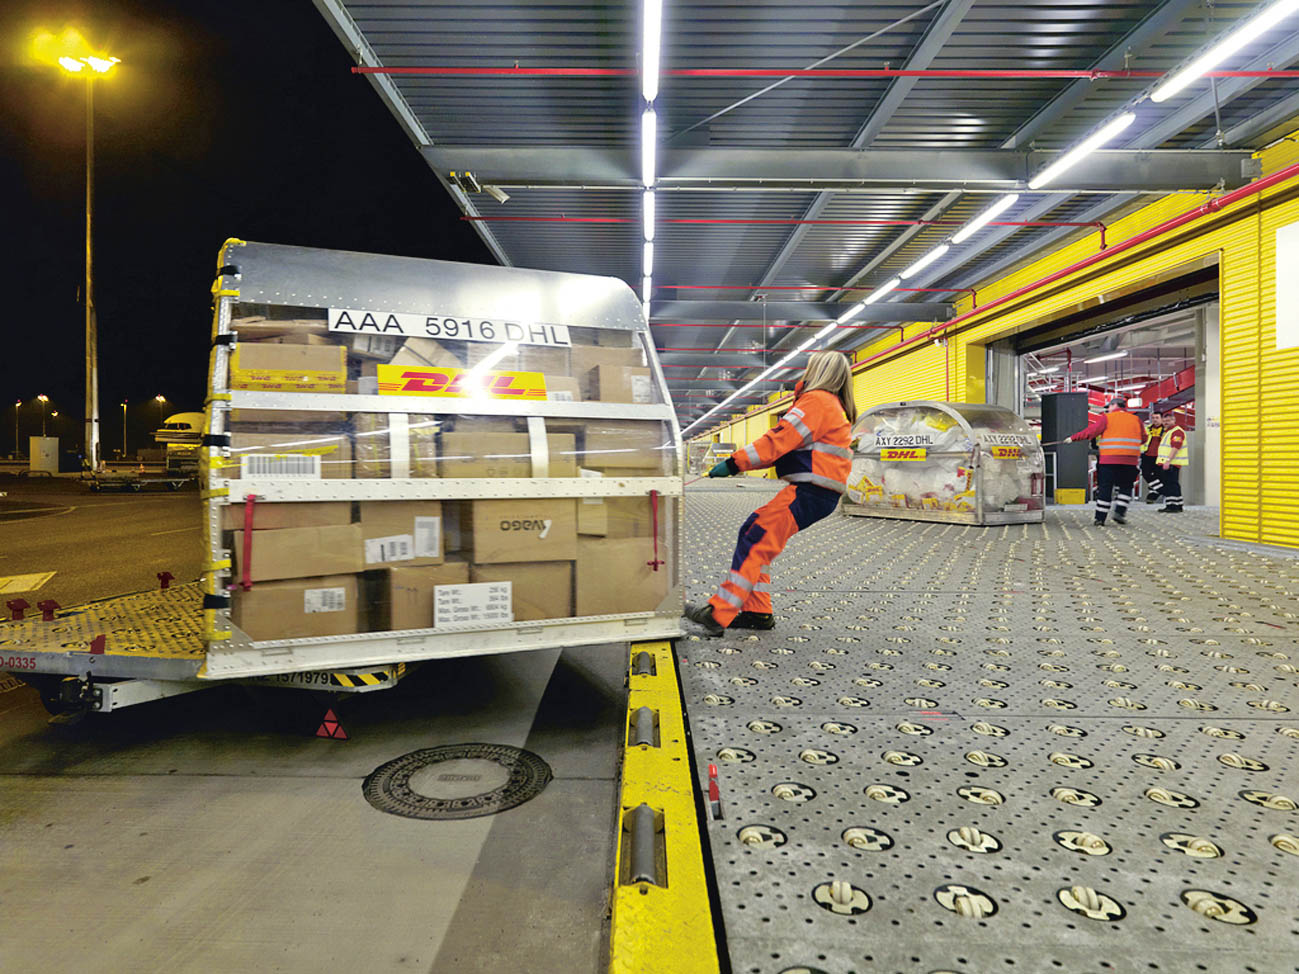 Manipulace sleteckým kontejnerem.